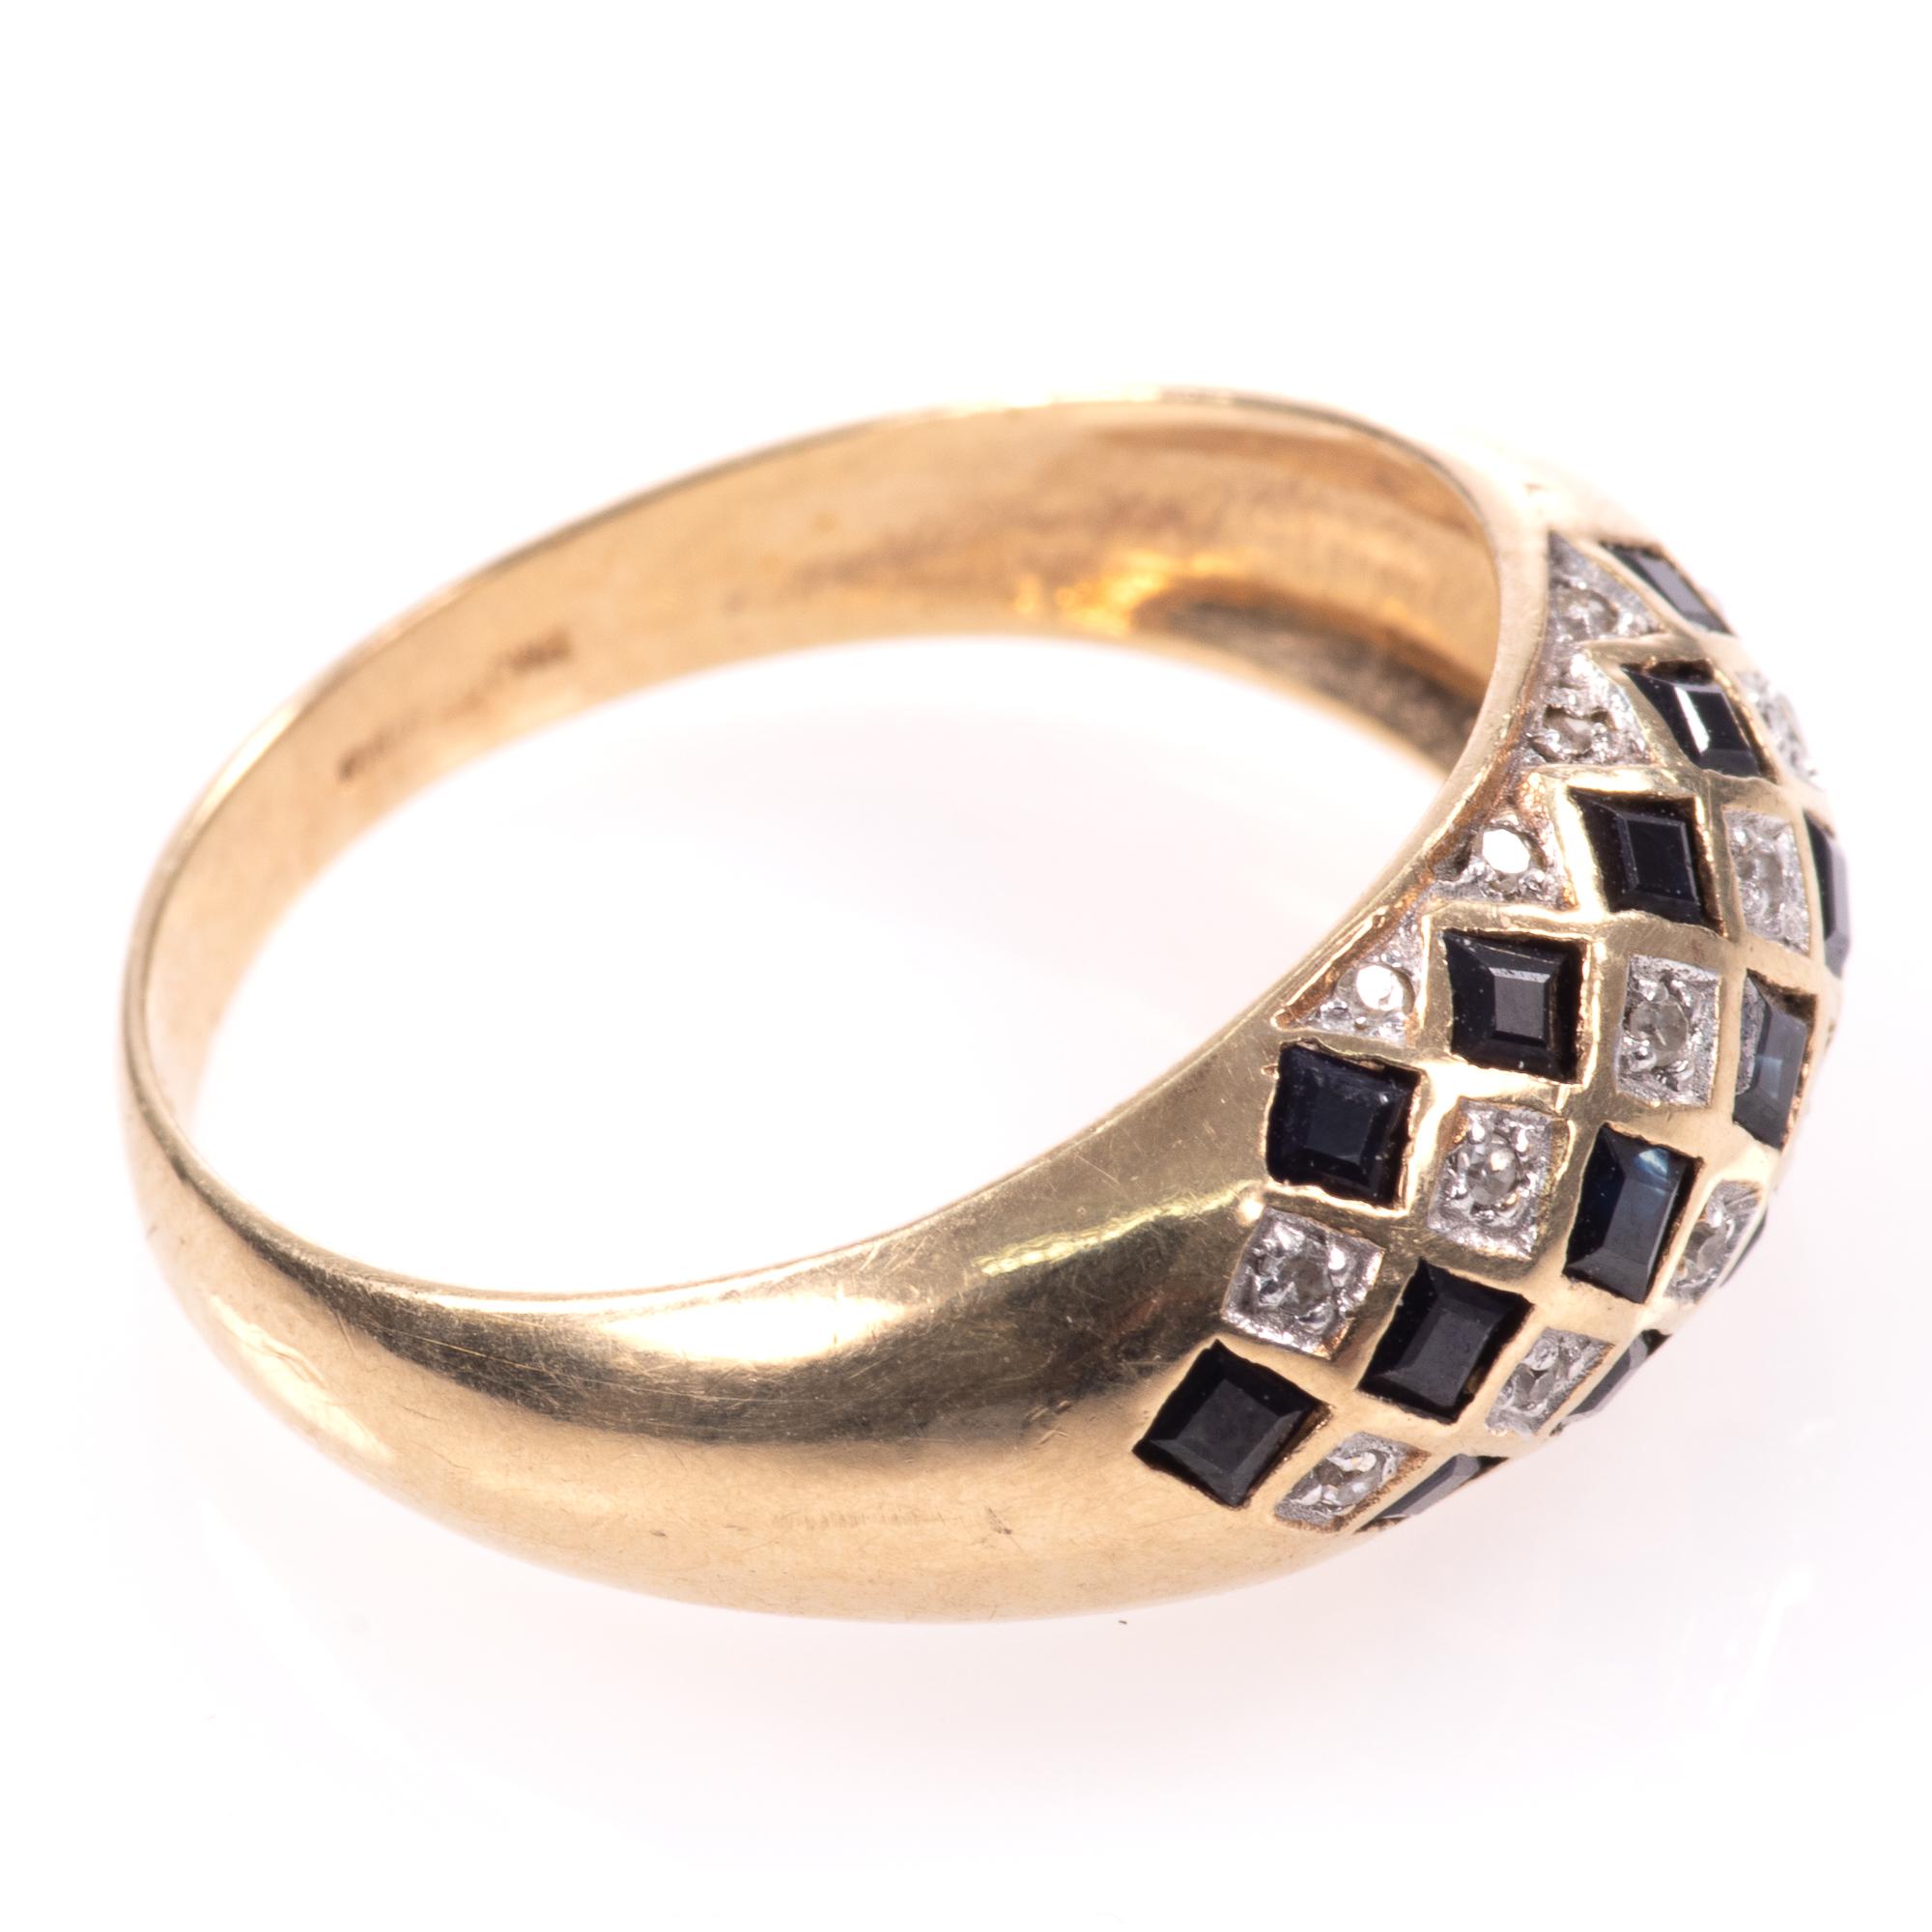 9ct Gold Art Deco Style 0.68ct Sapphire & Diamond Ring - Image 8 of 8